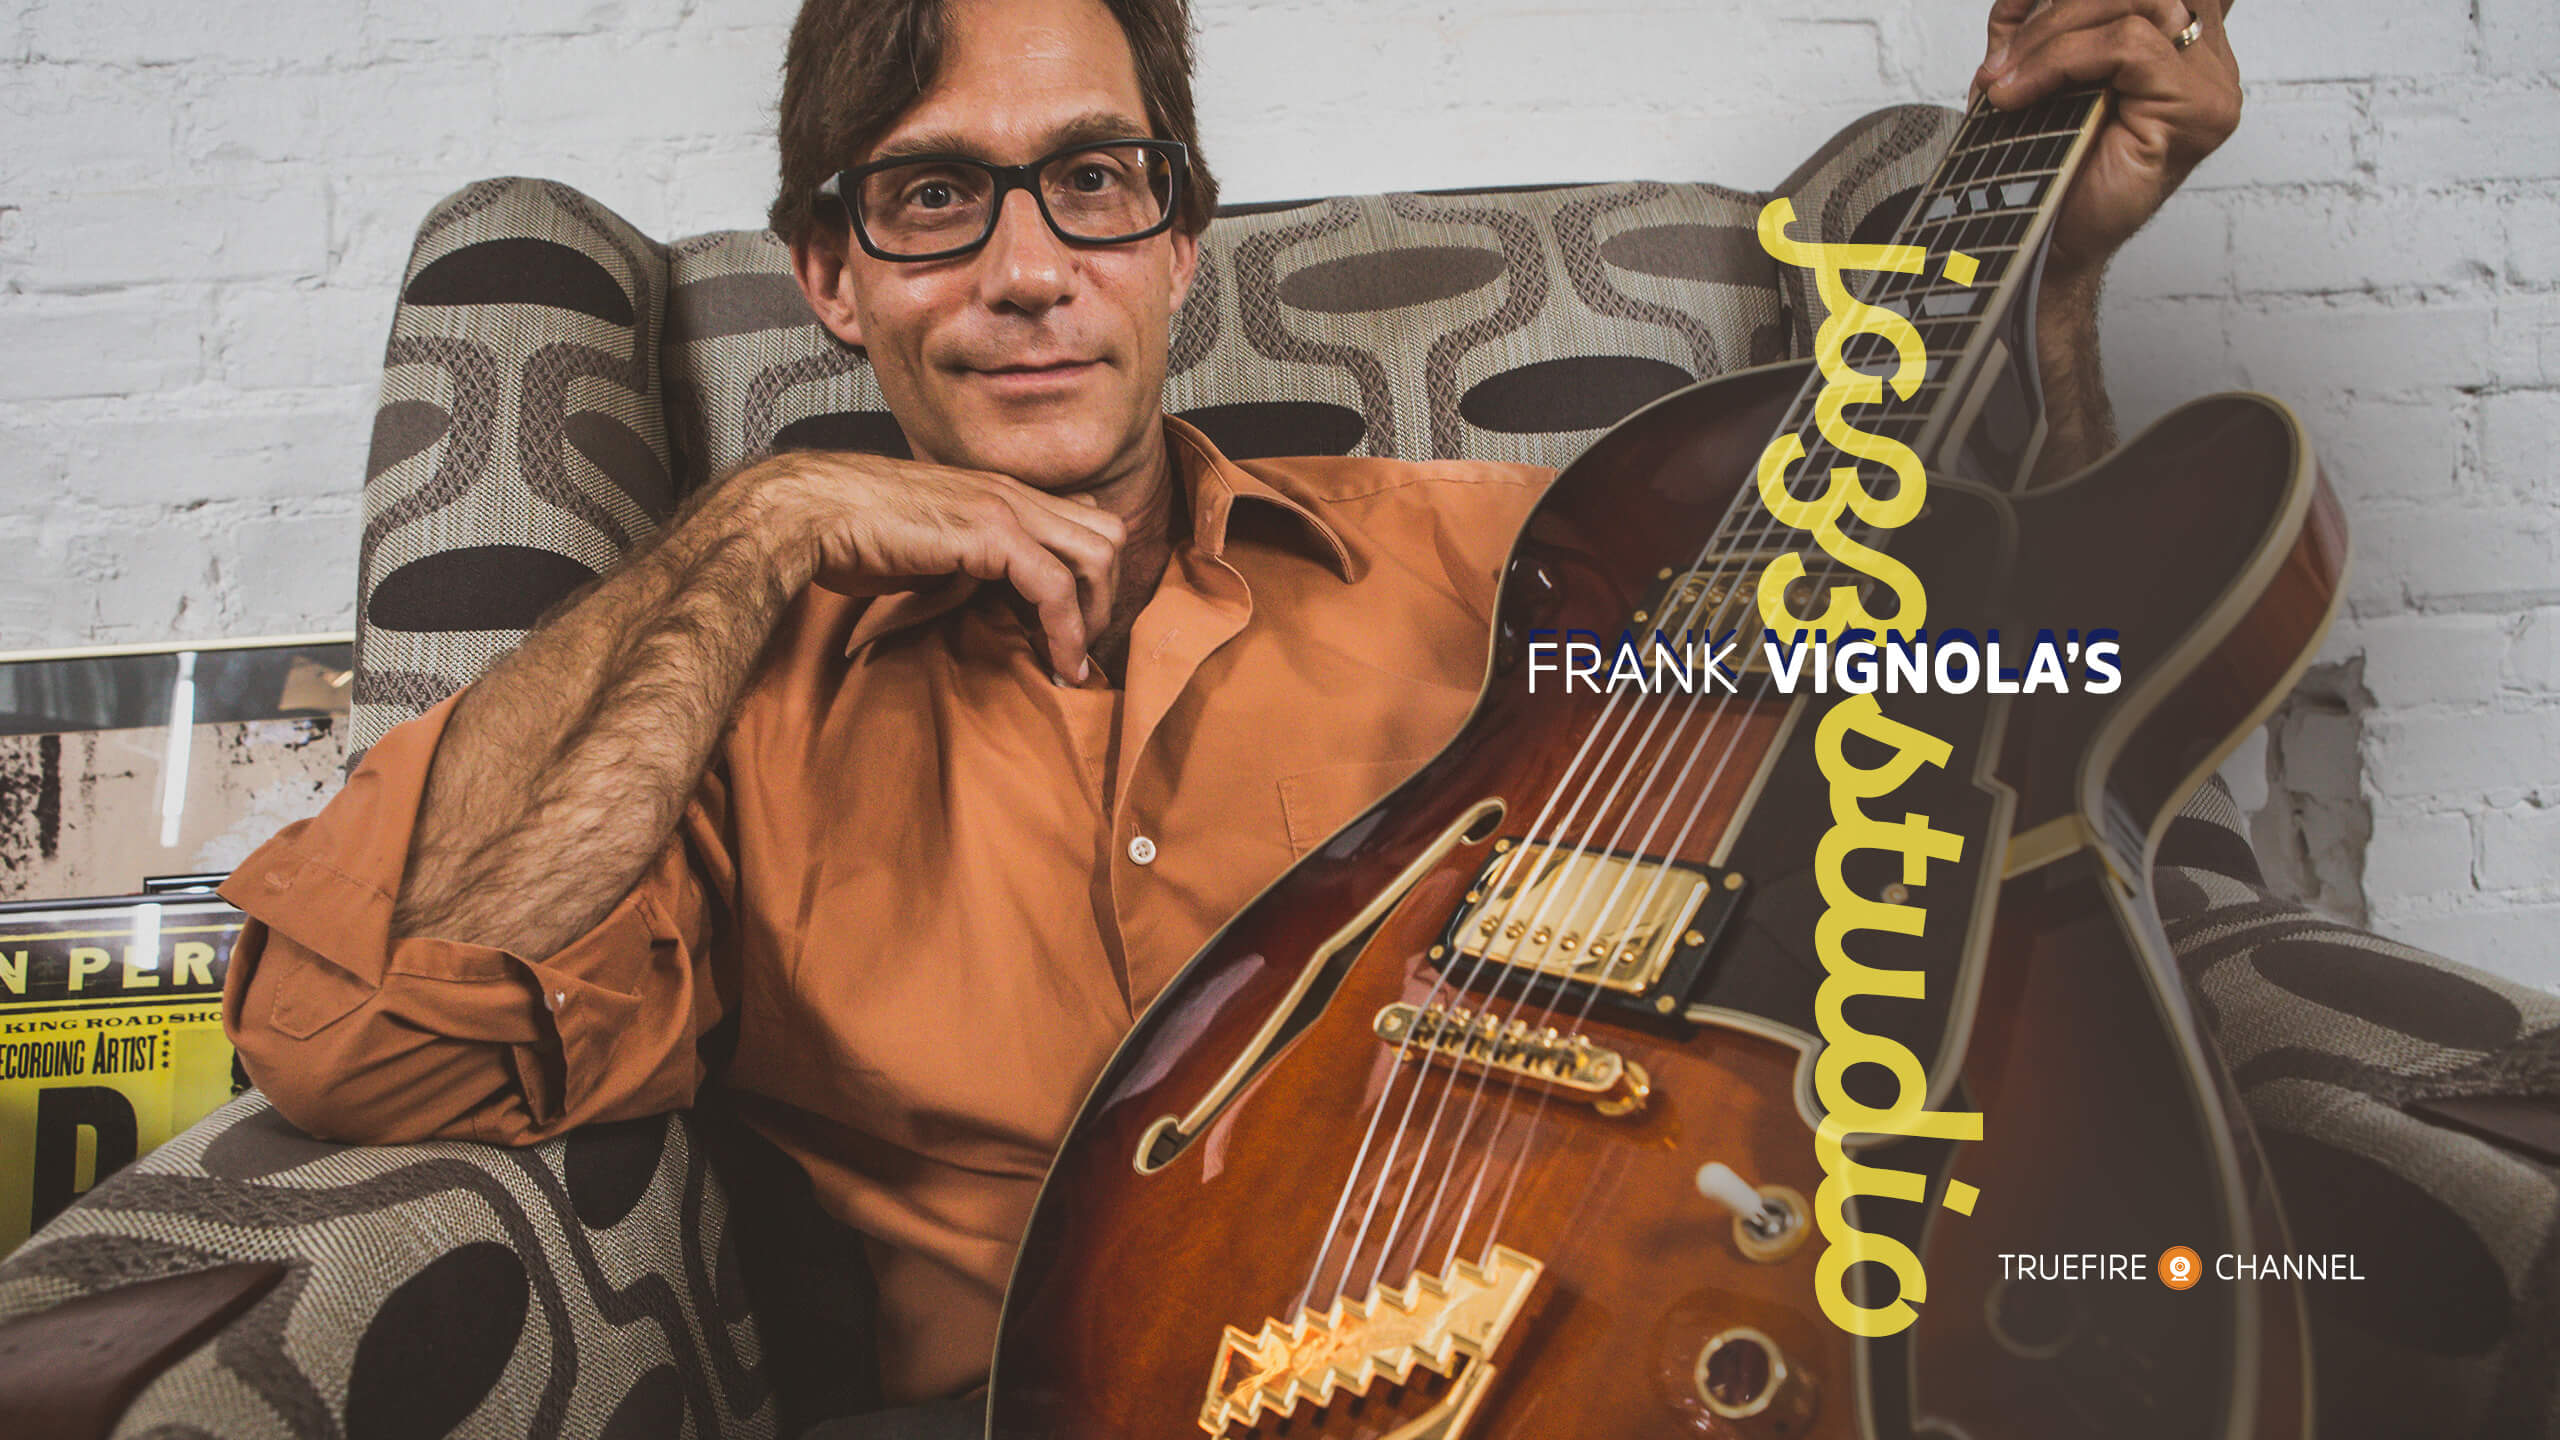 What's New - Frank Vignola's Jazz Studio - Channels - TrueFire